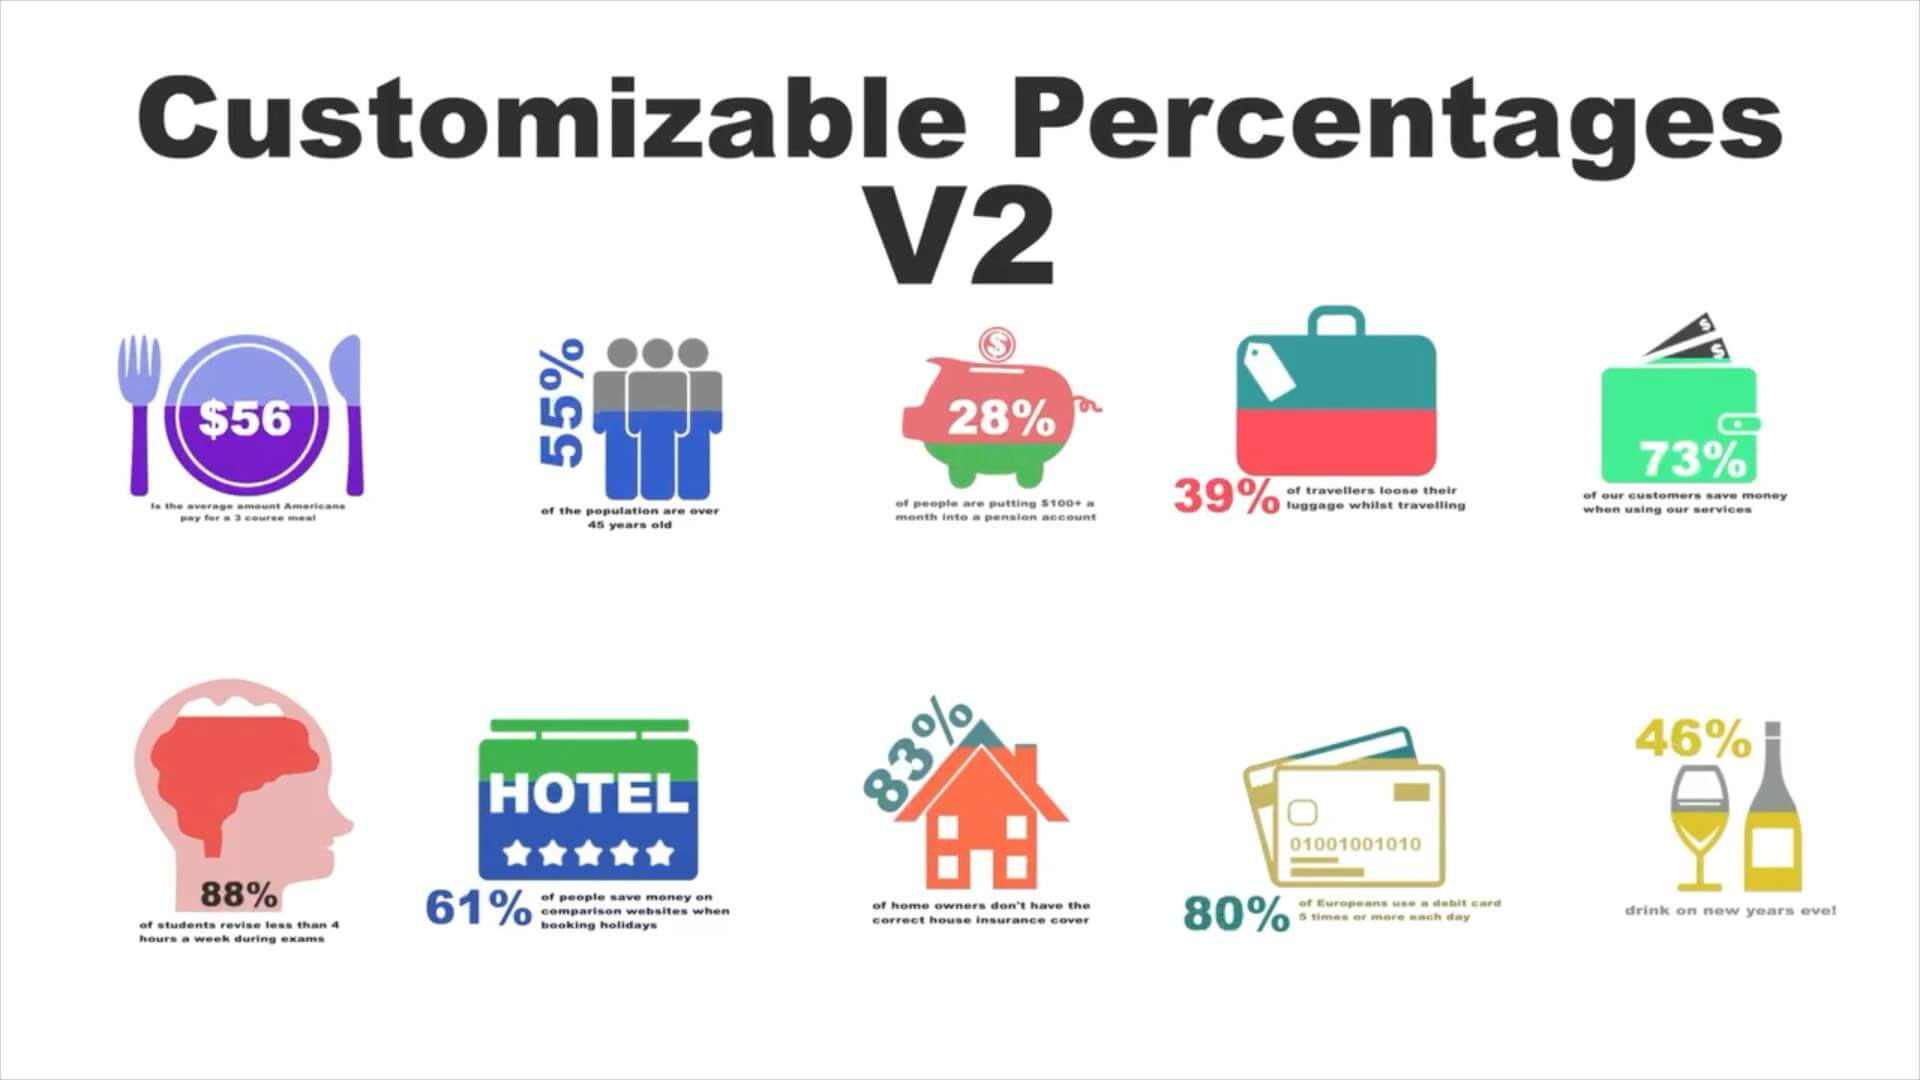 Fcpx插件 10款卡通交互式可自定义百分比滑块动画预设 V2 Percentage Sliders